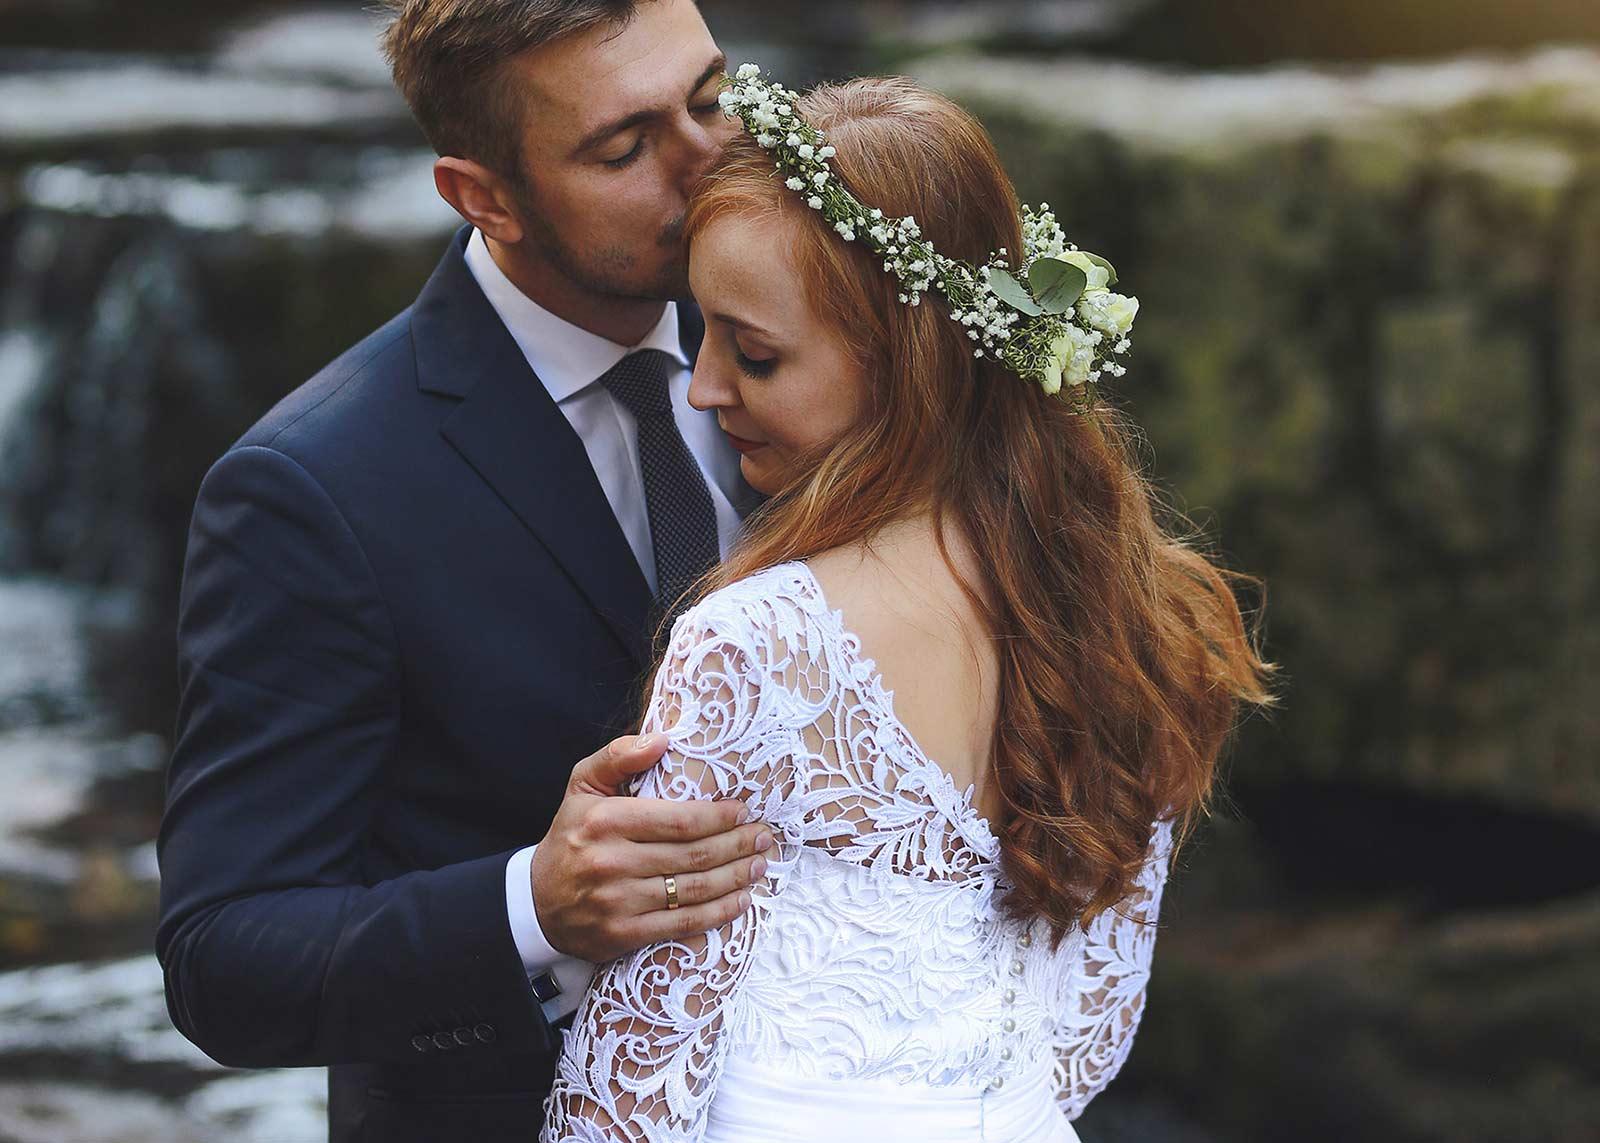 sesja ślubna pary młodej nad wodospadem